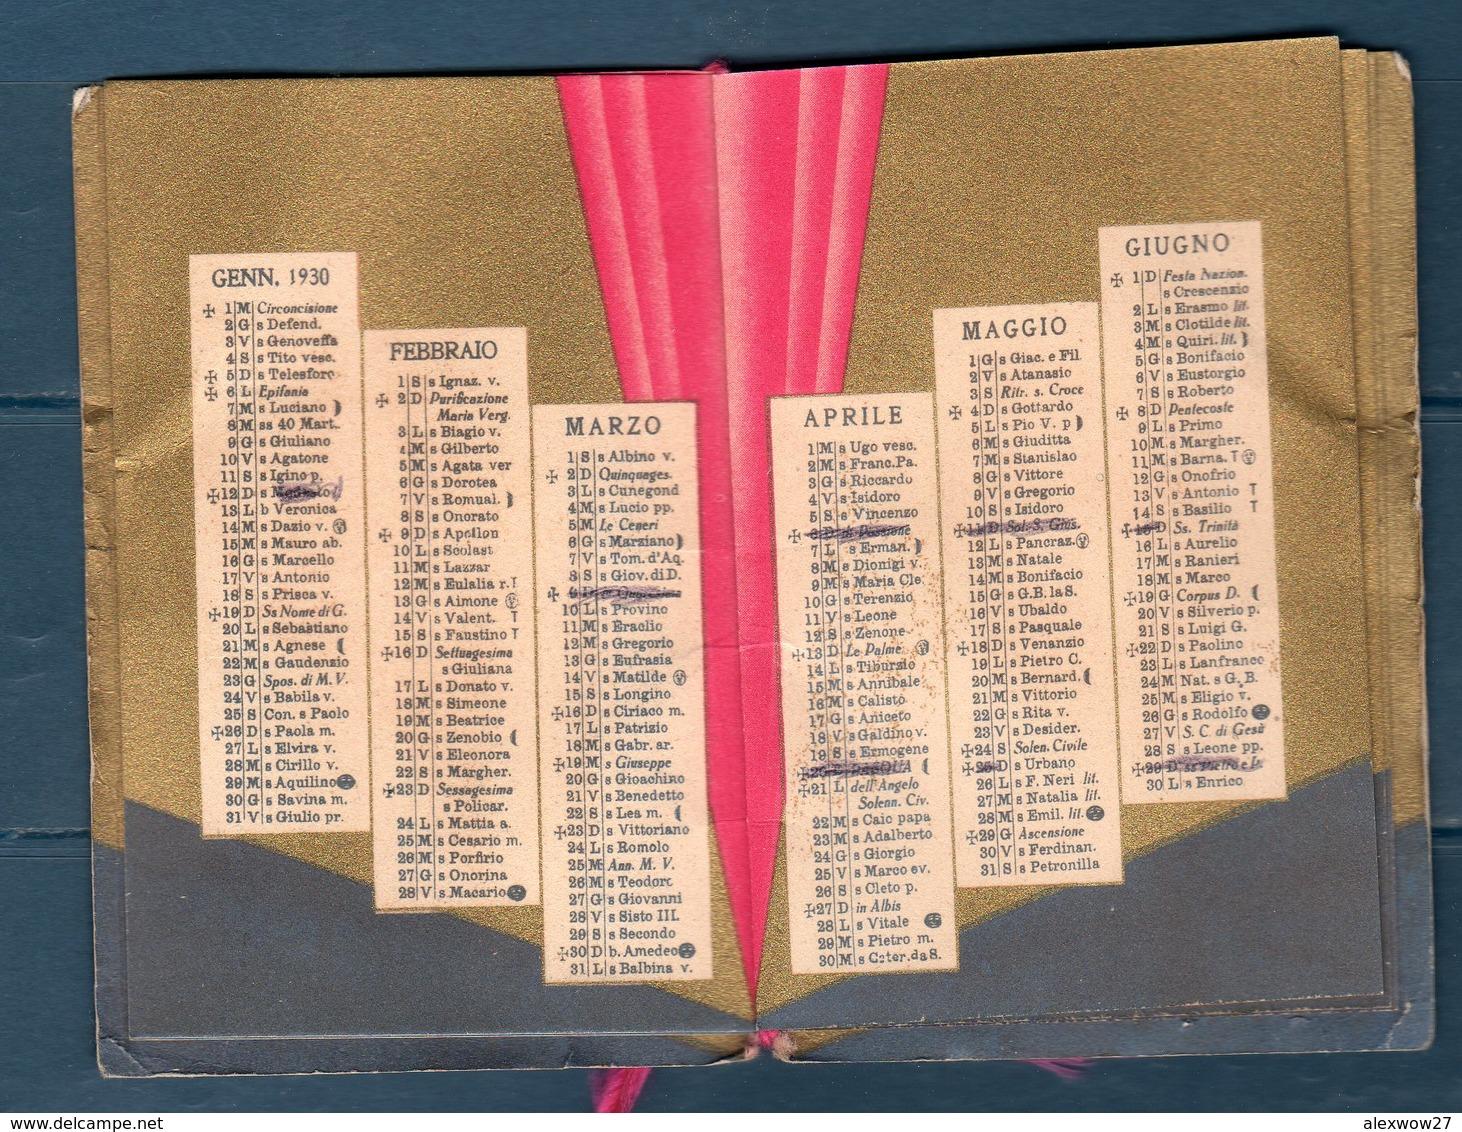 Calendario 1930 7 Bellezze - Formato Piccolo : 1921-40